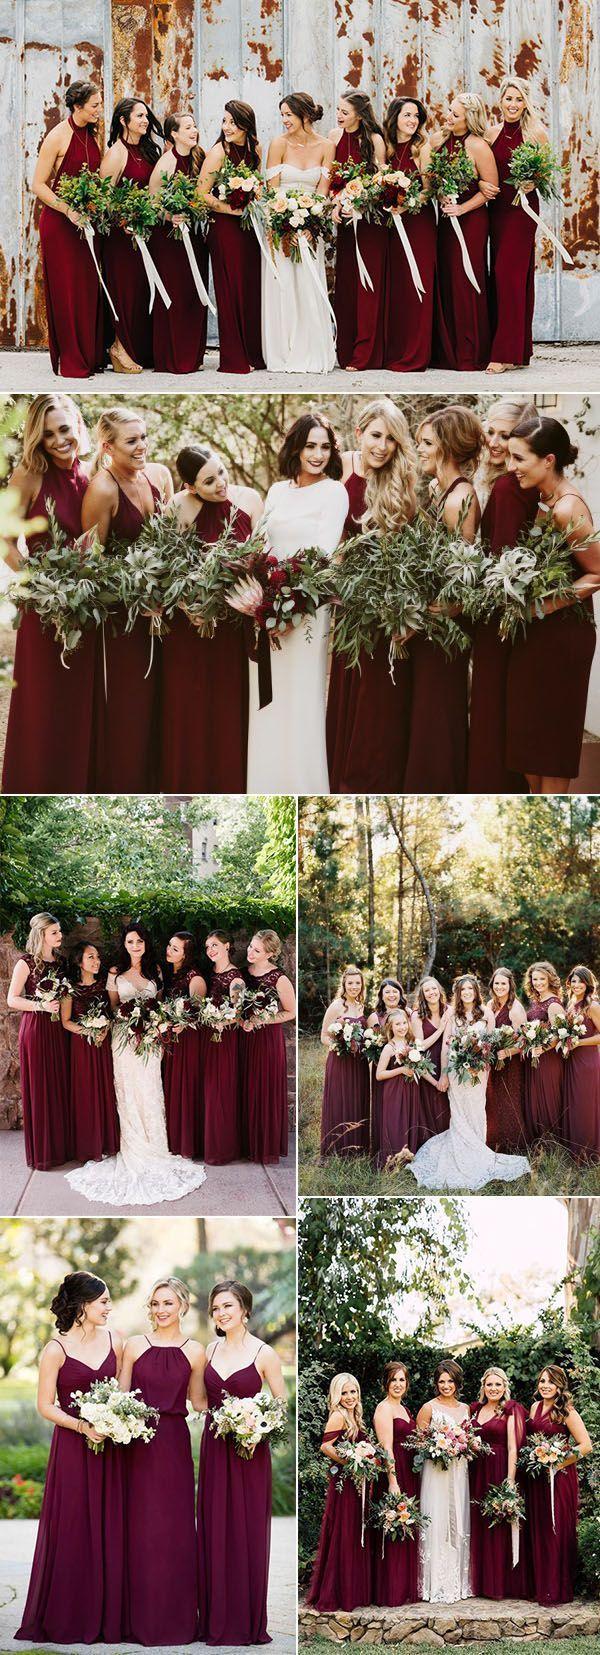 Wedding decorations to make february 2019 chic burgundy bridesmaid dresses ideas for fall weddings cake